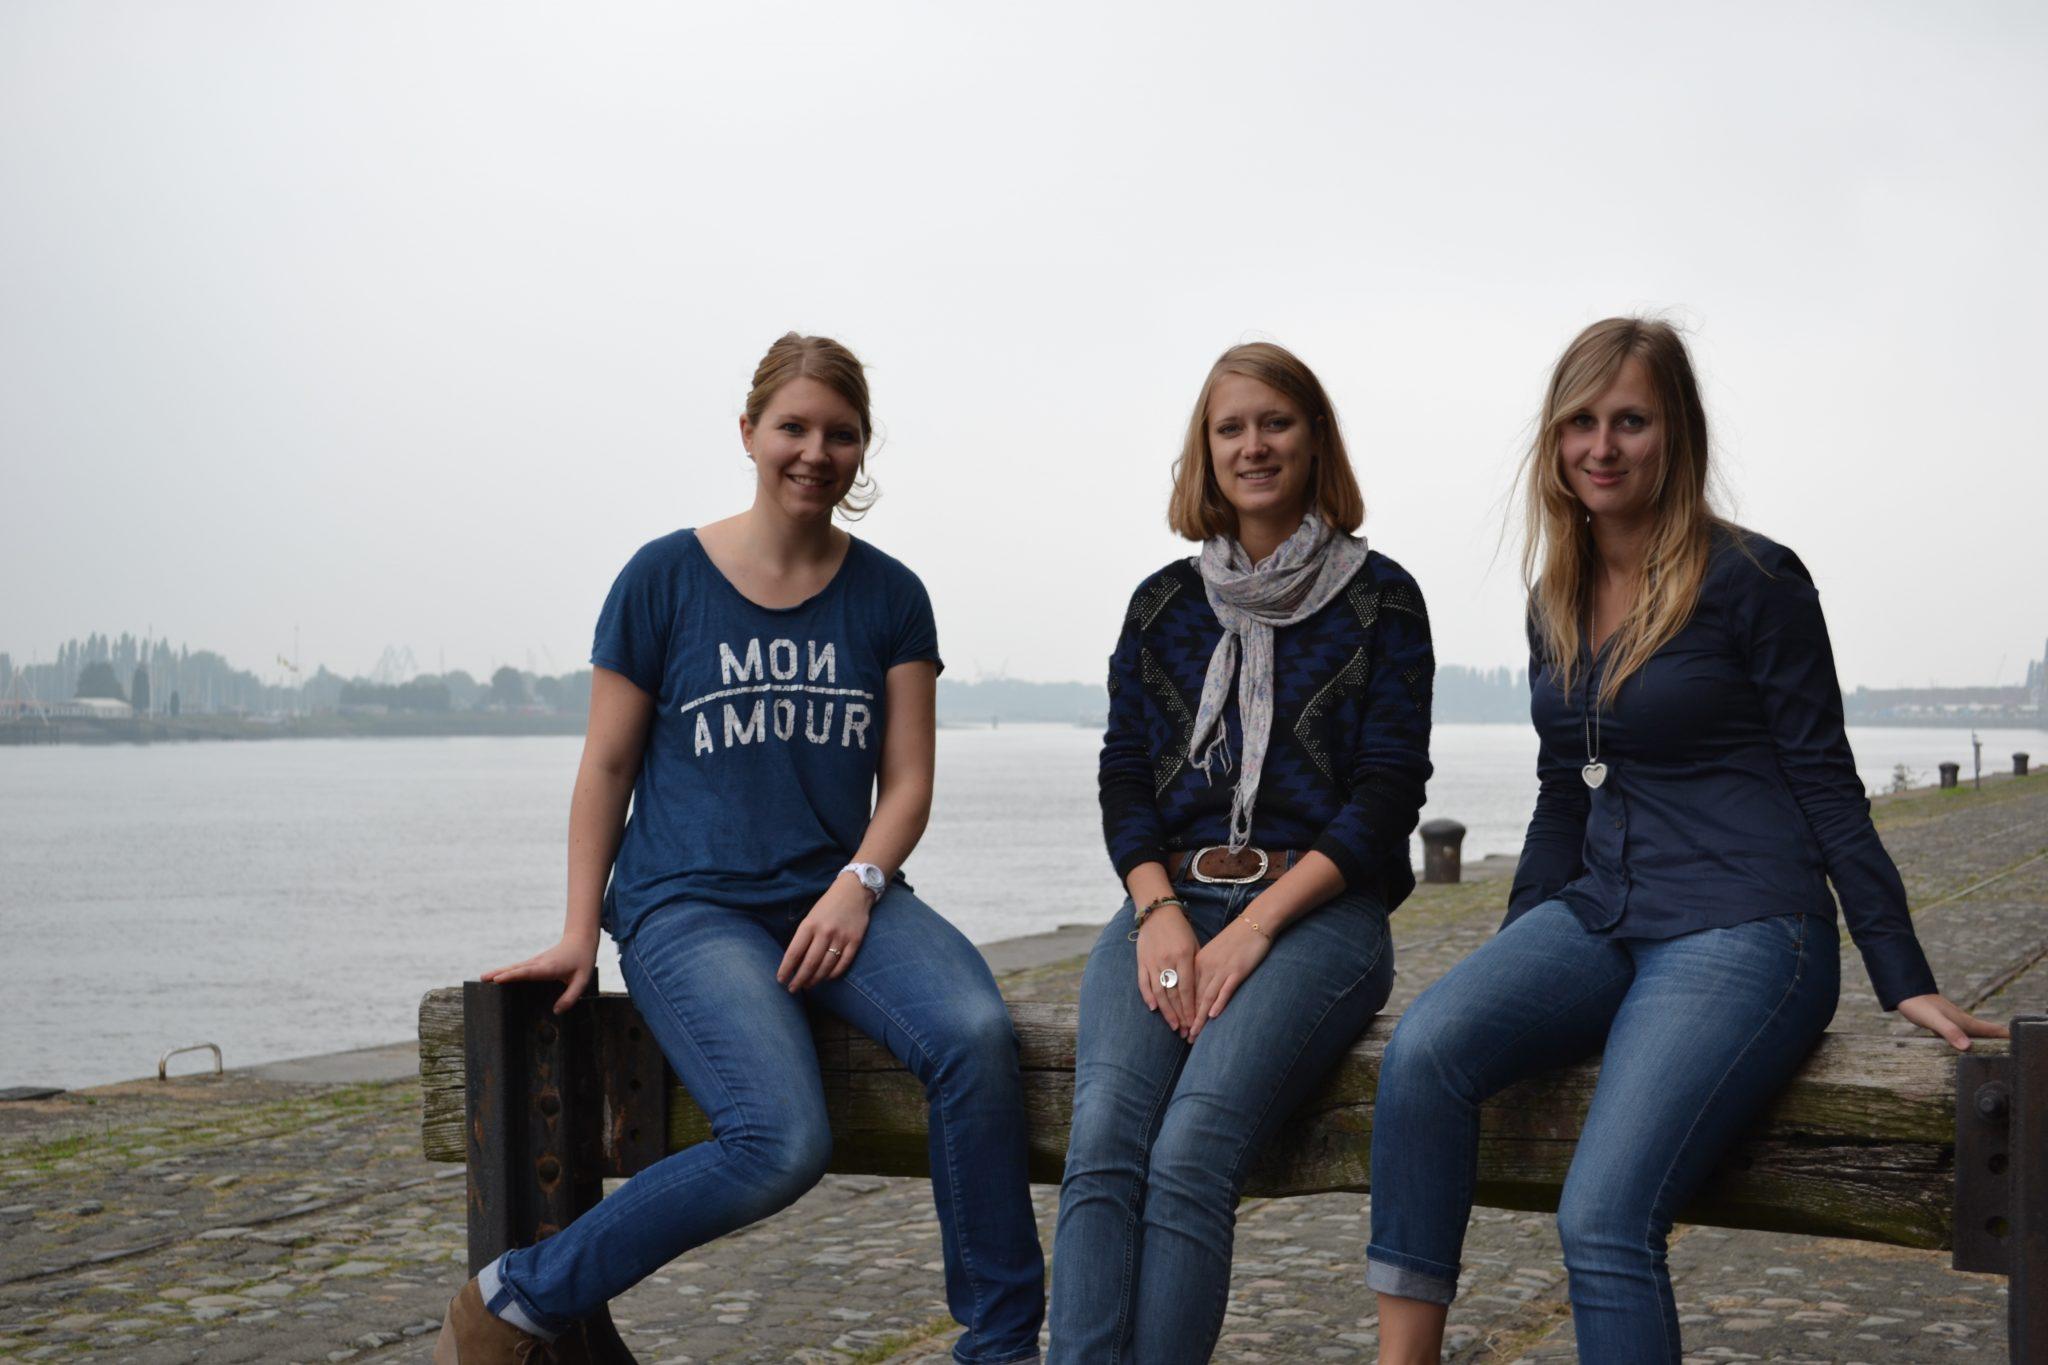 Travel Diary: Antwerpen | Belgium - dsc 0054